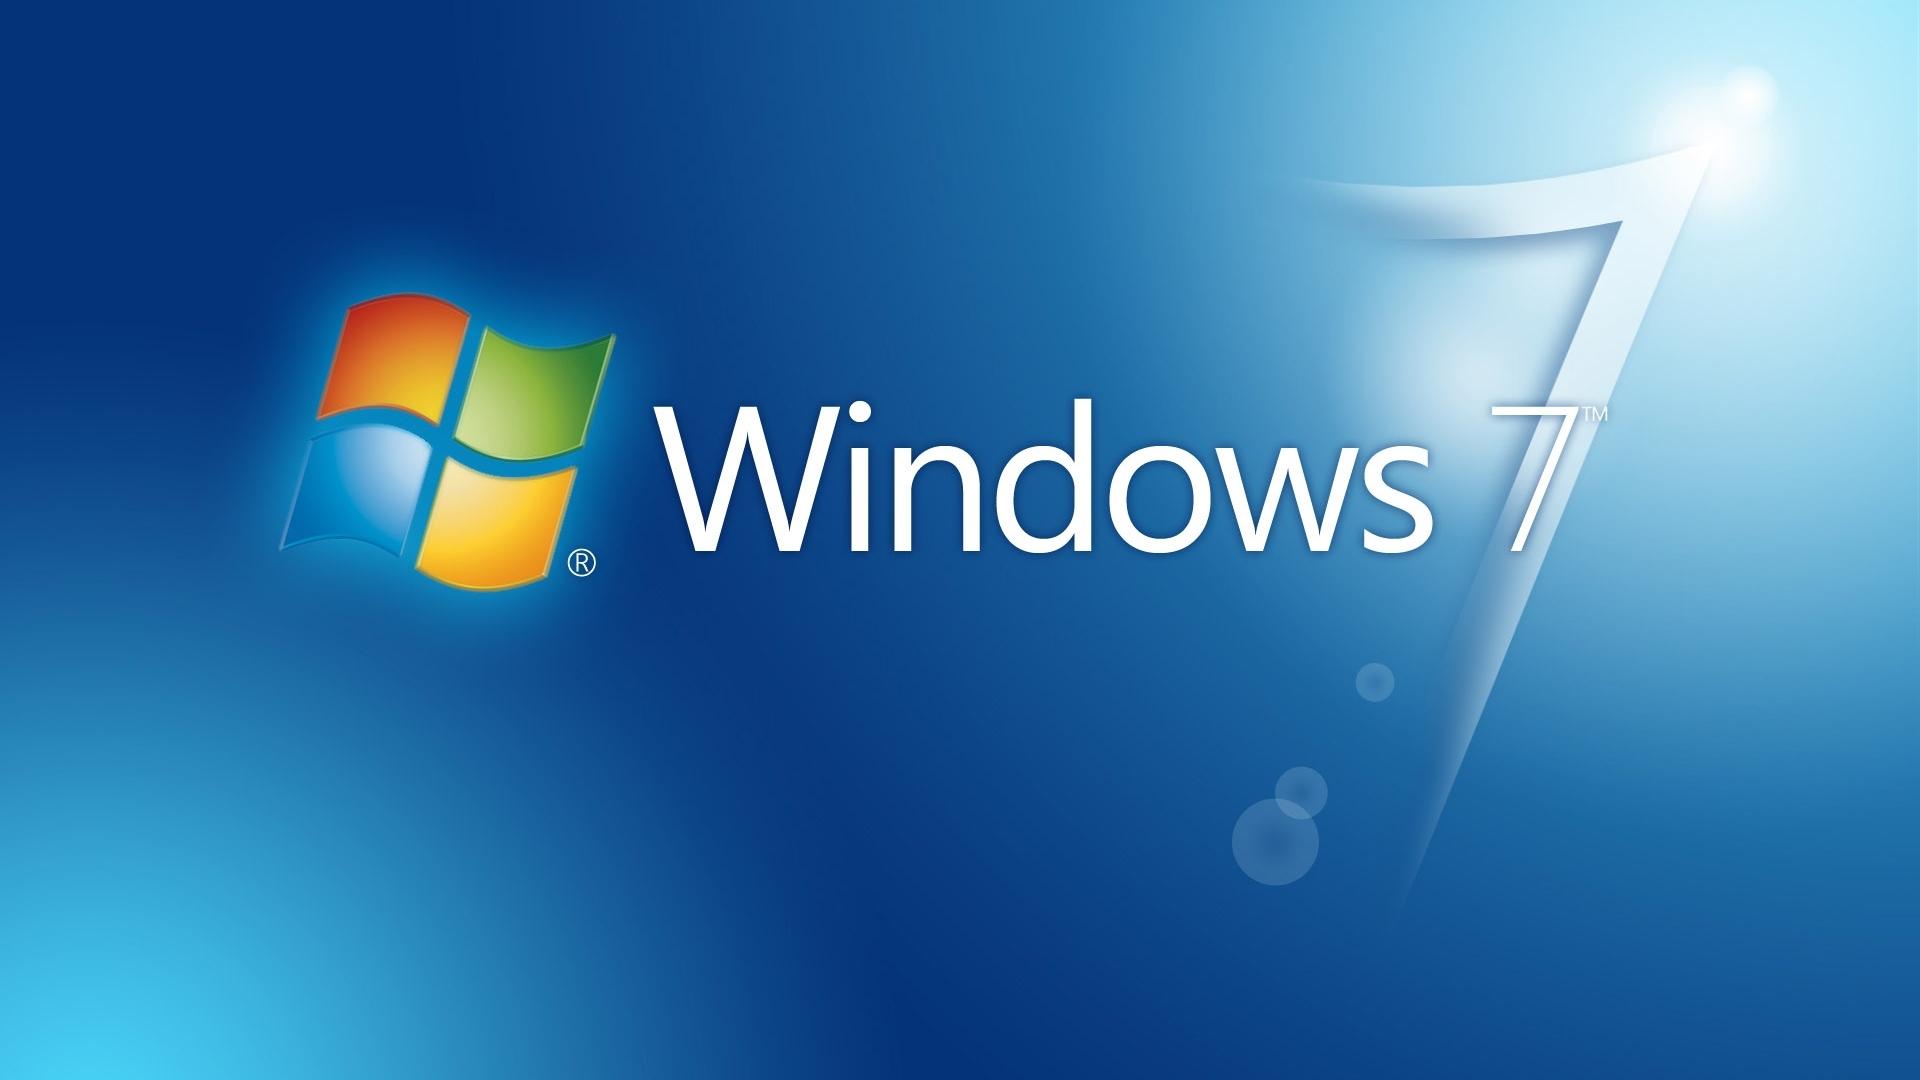 Windows 7 hd desktop wallpapers